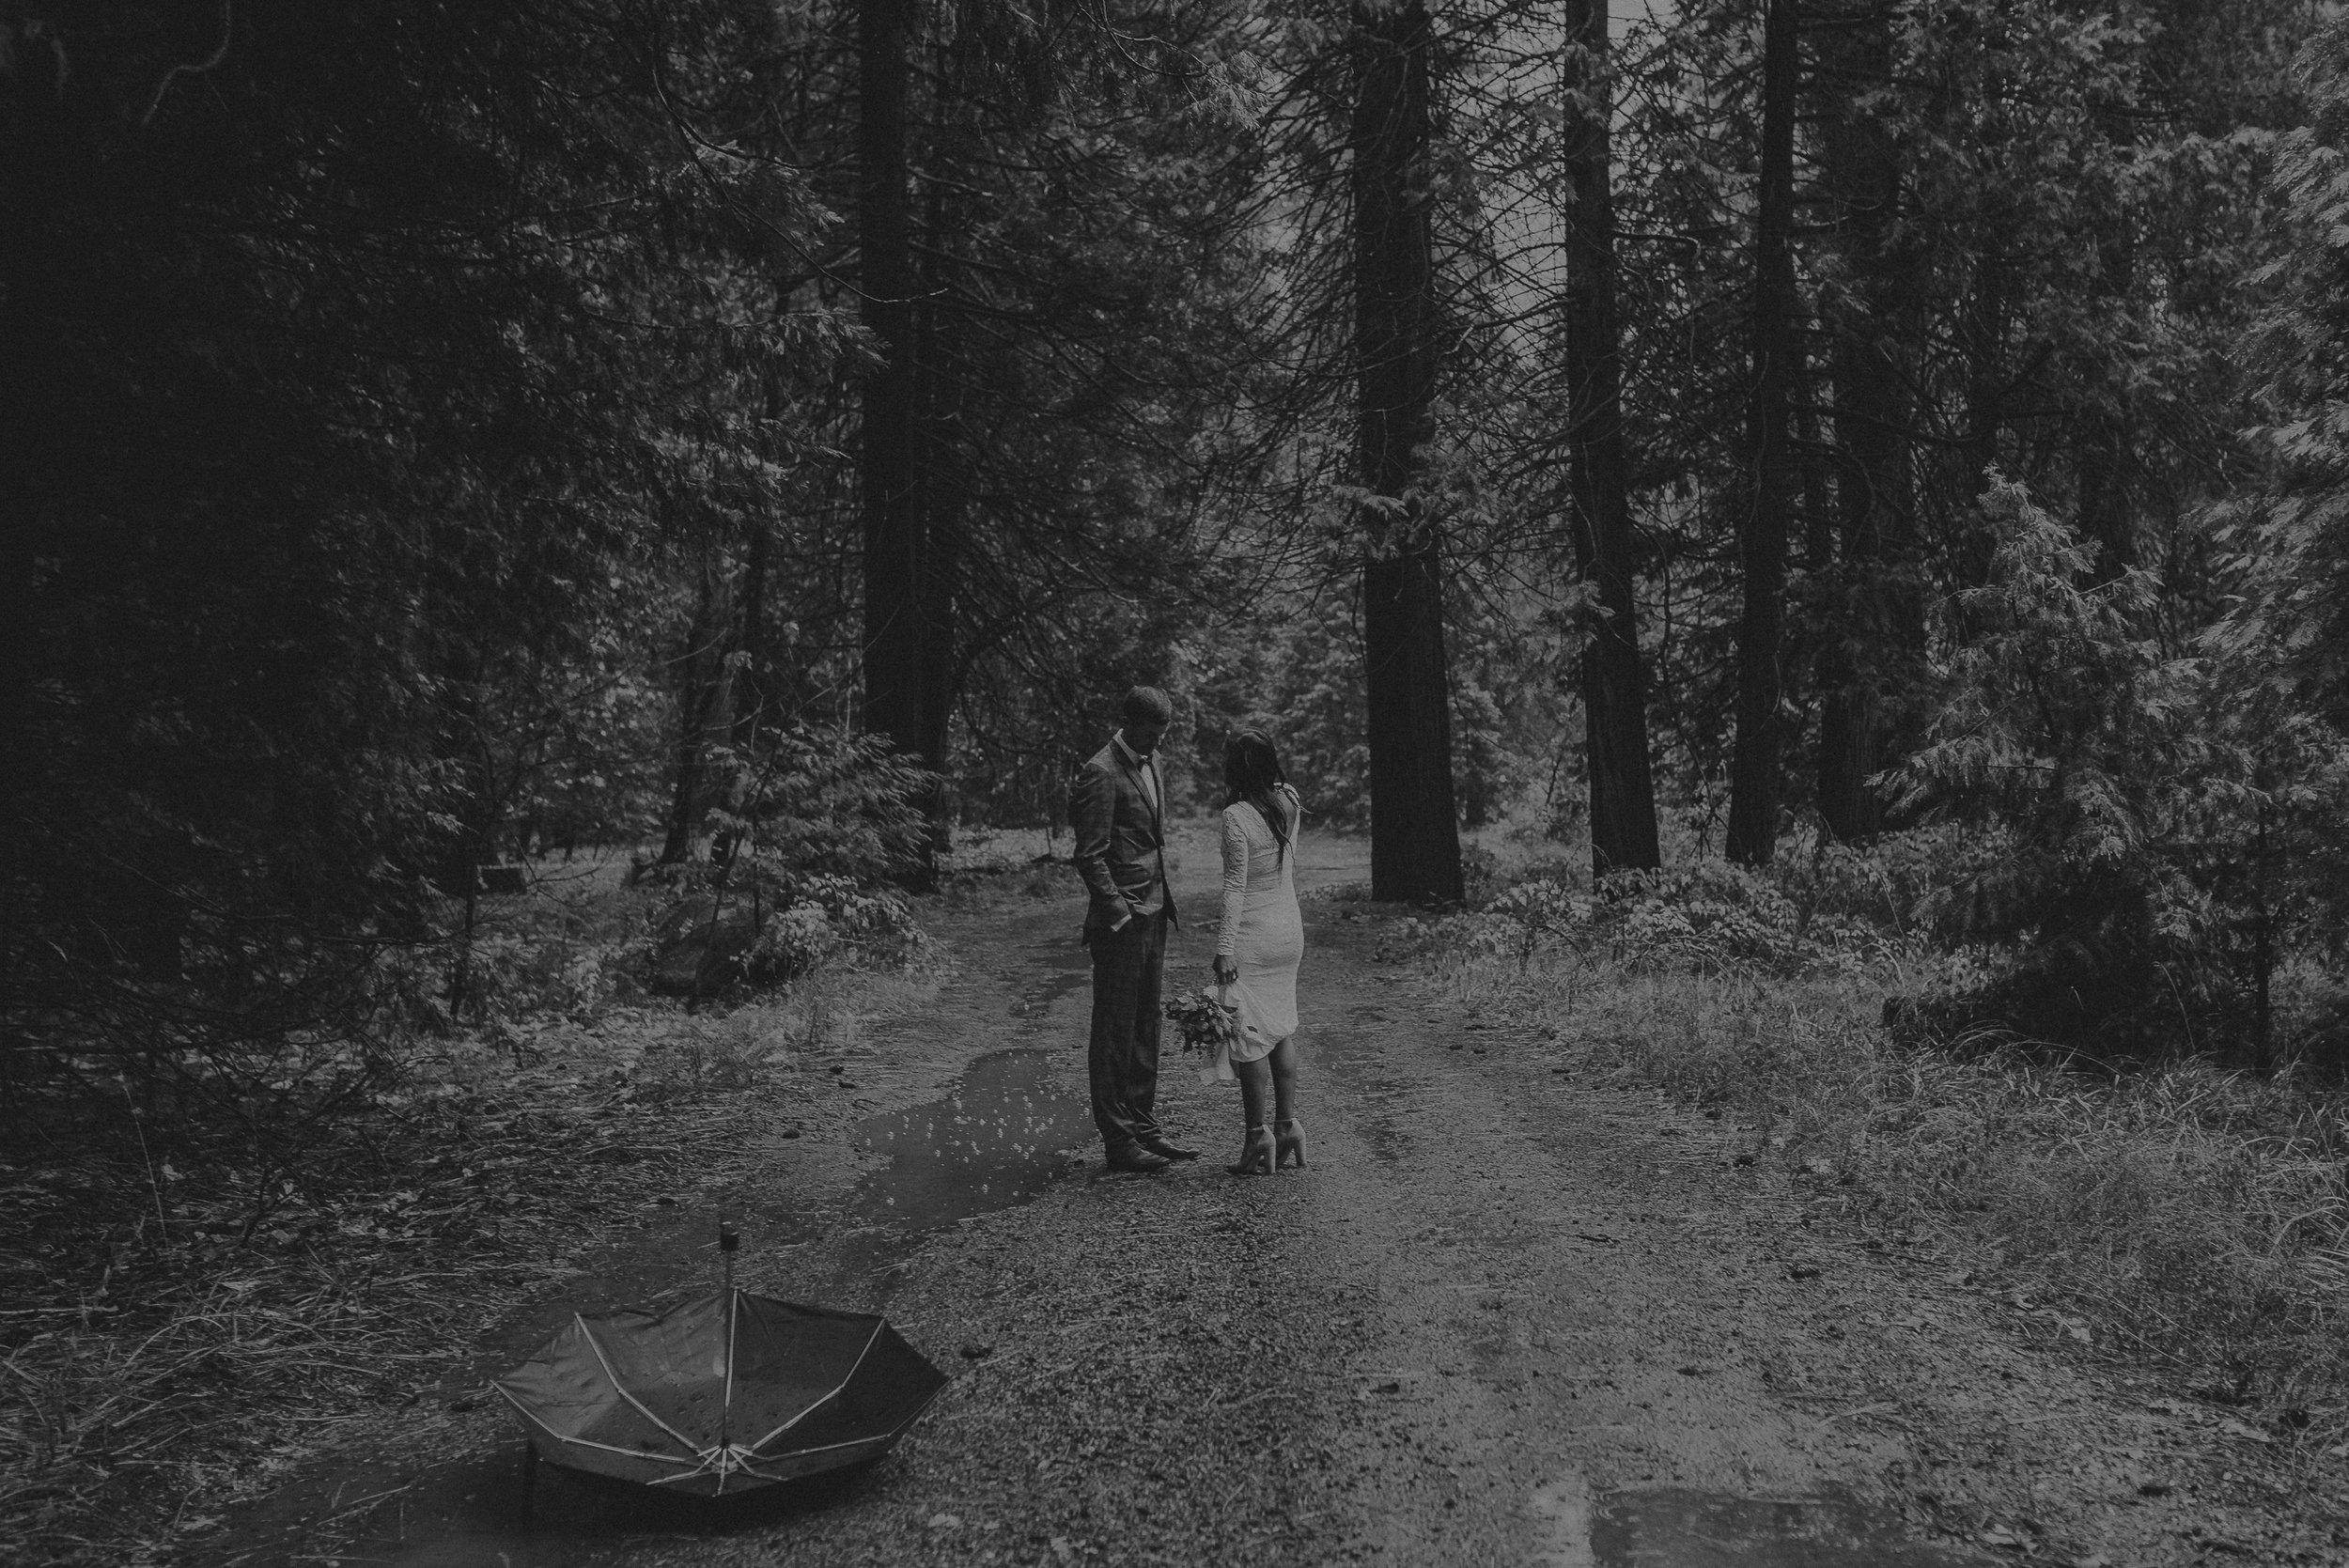 Isaiah + Taylor Photography - Yosemite Elopement - Los Angeles Wedding Photographer-14.jpg